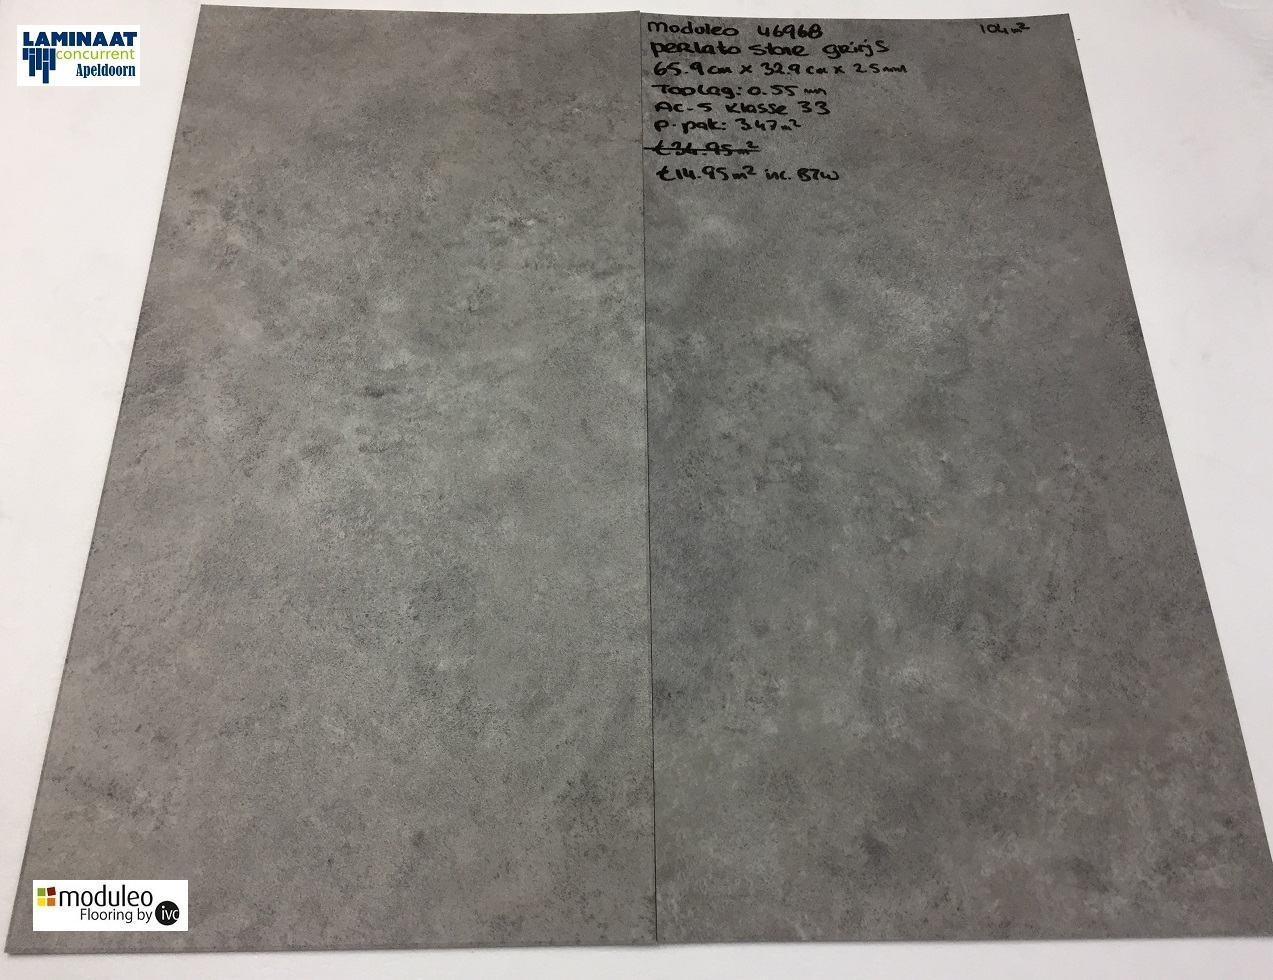 Plak Pvc Tegels : Perlato stone m plak pvc tegel laminaat grijs laminaat